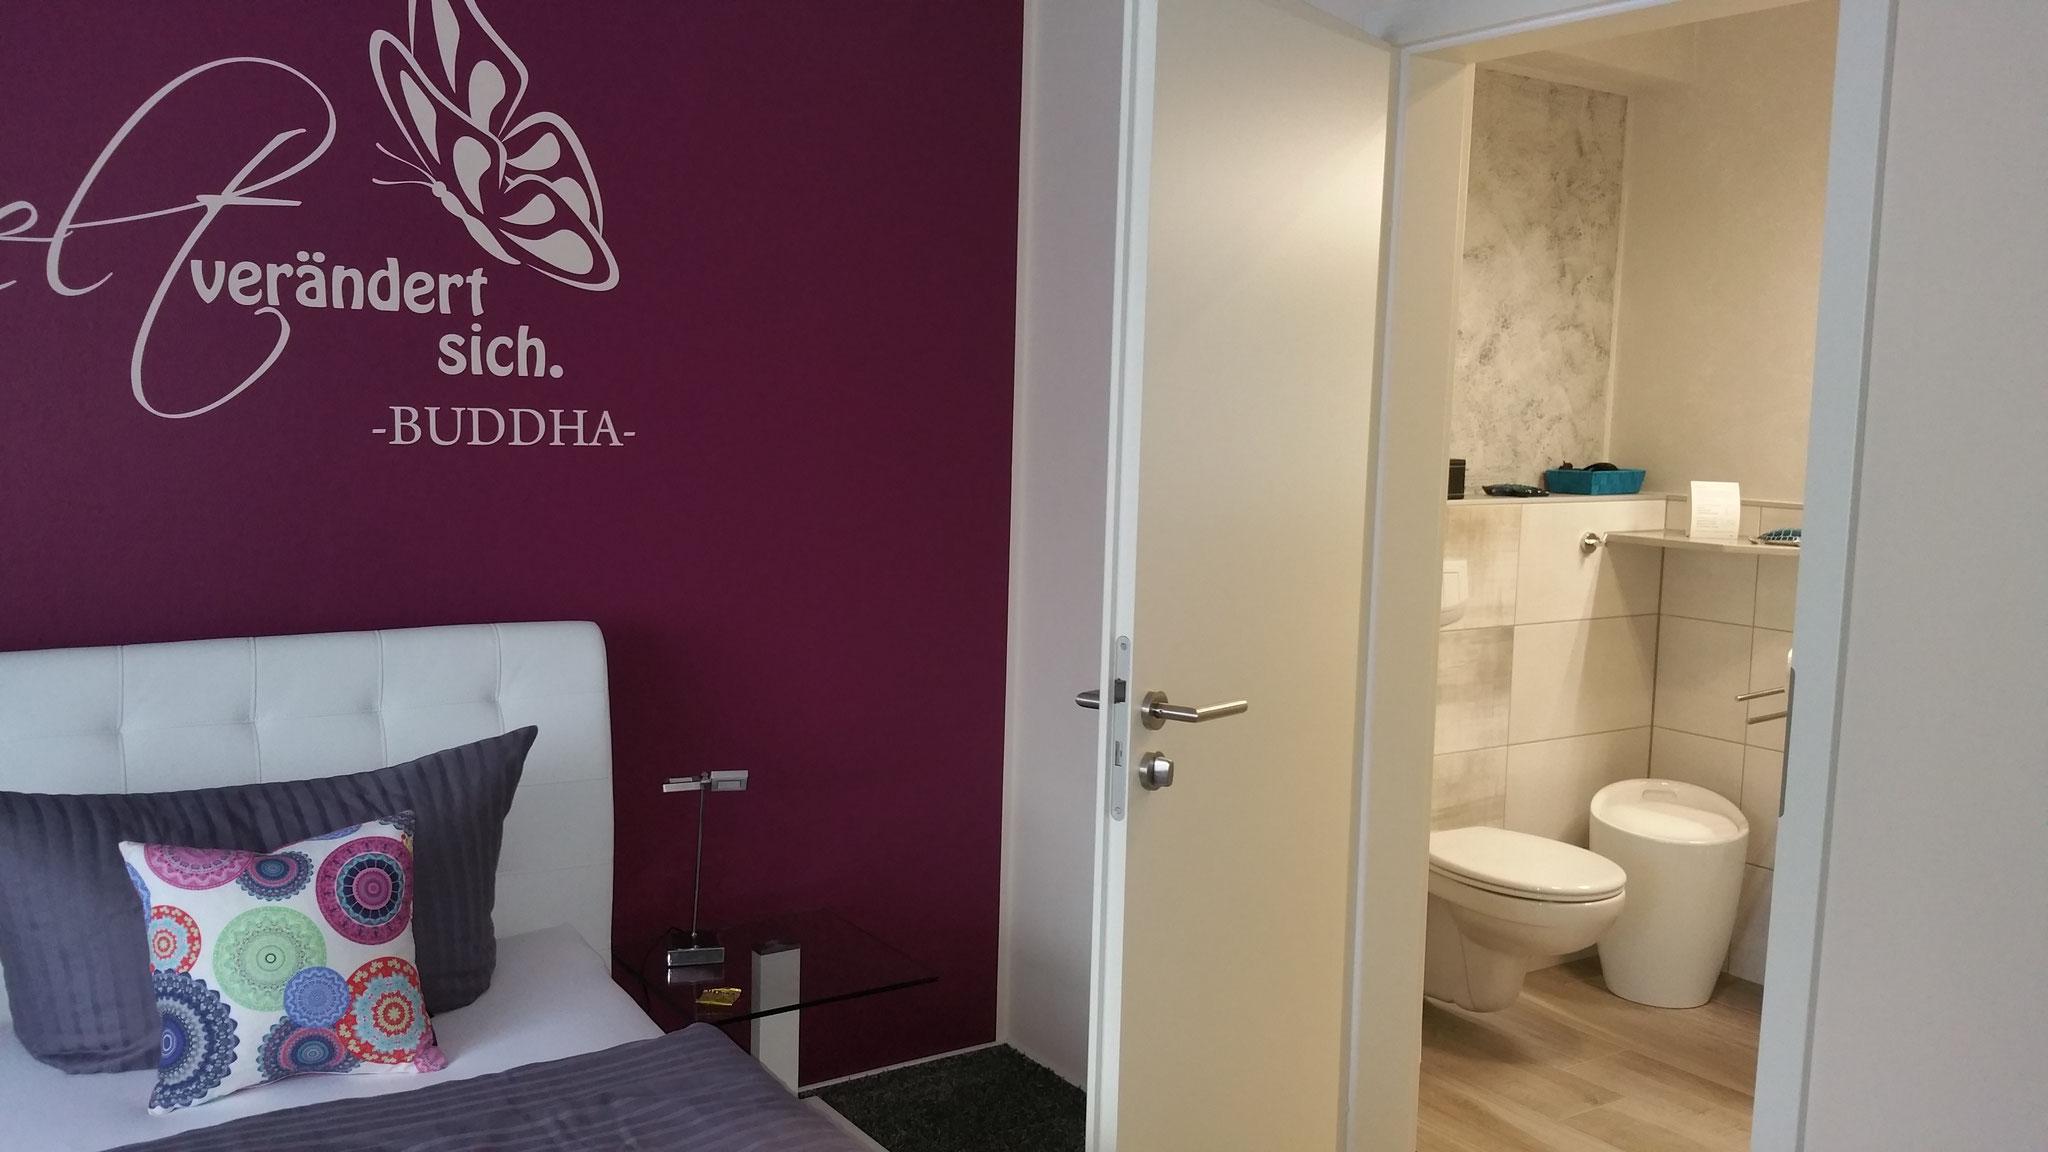 Deluxe Zimmer 2 - Badezimmer-Einblicke